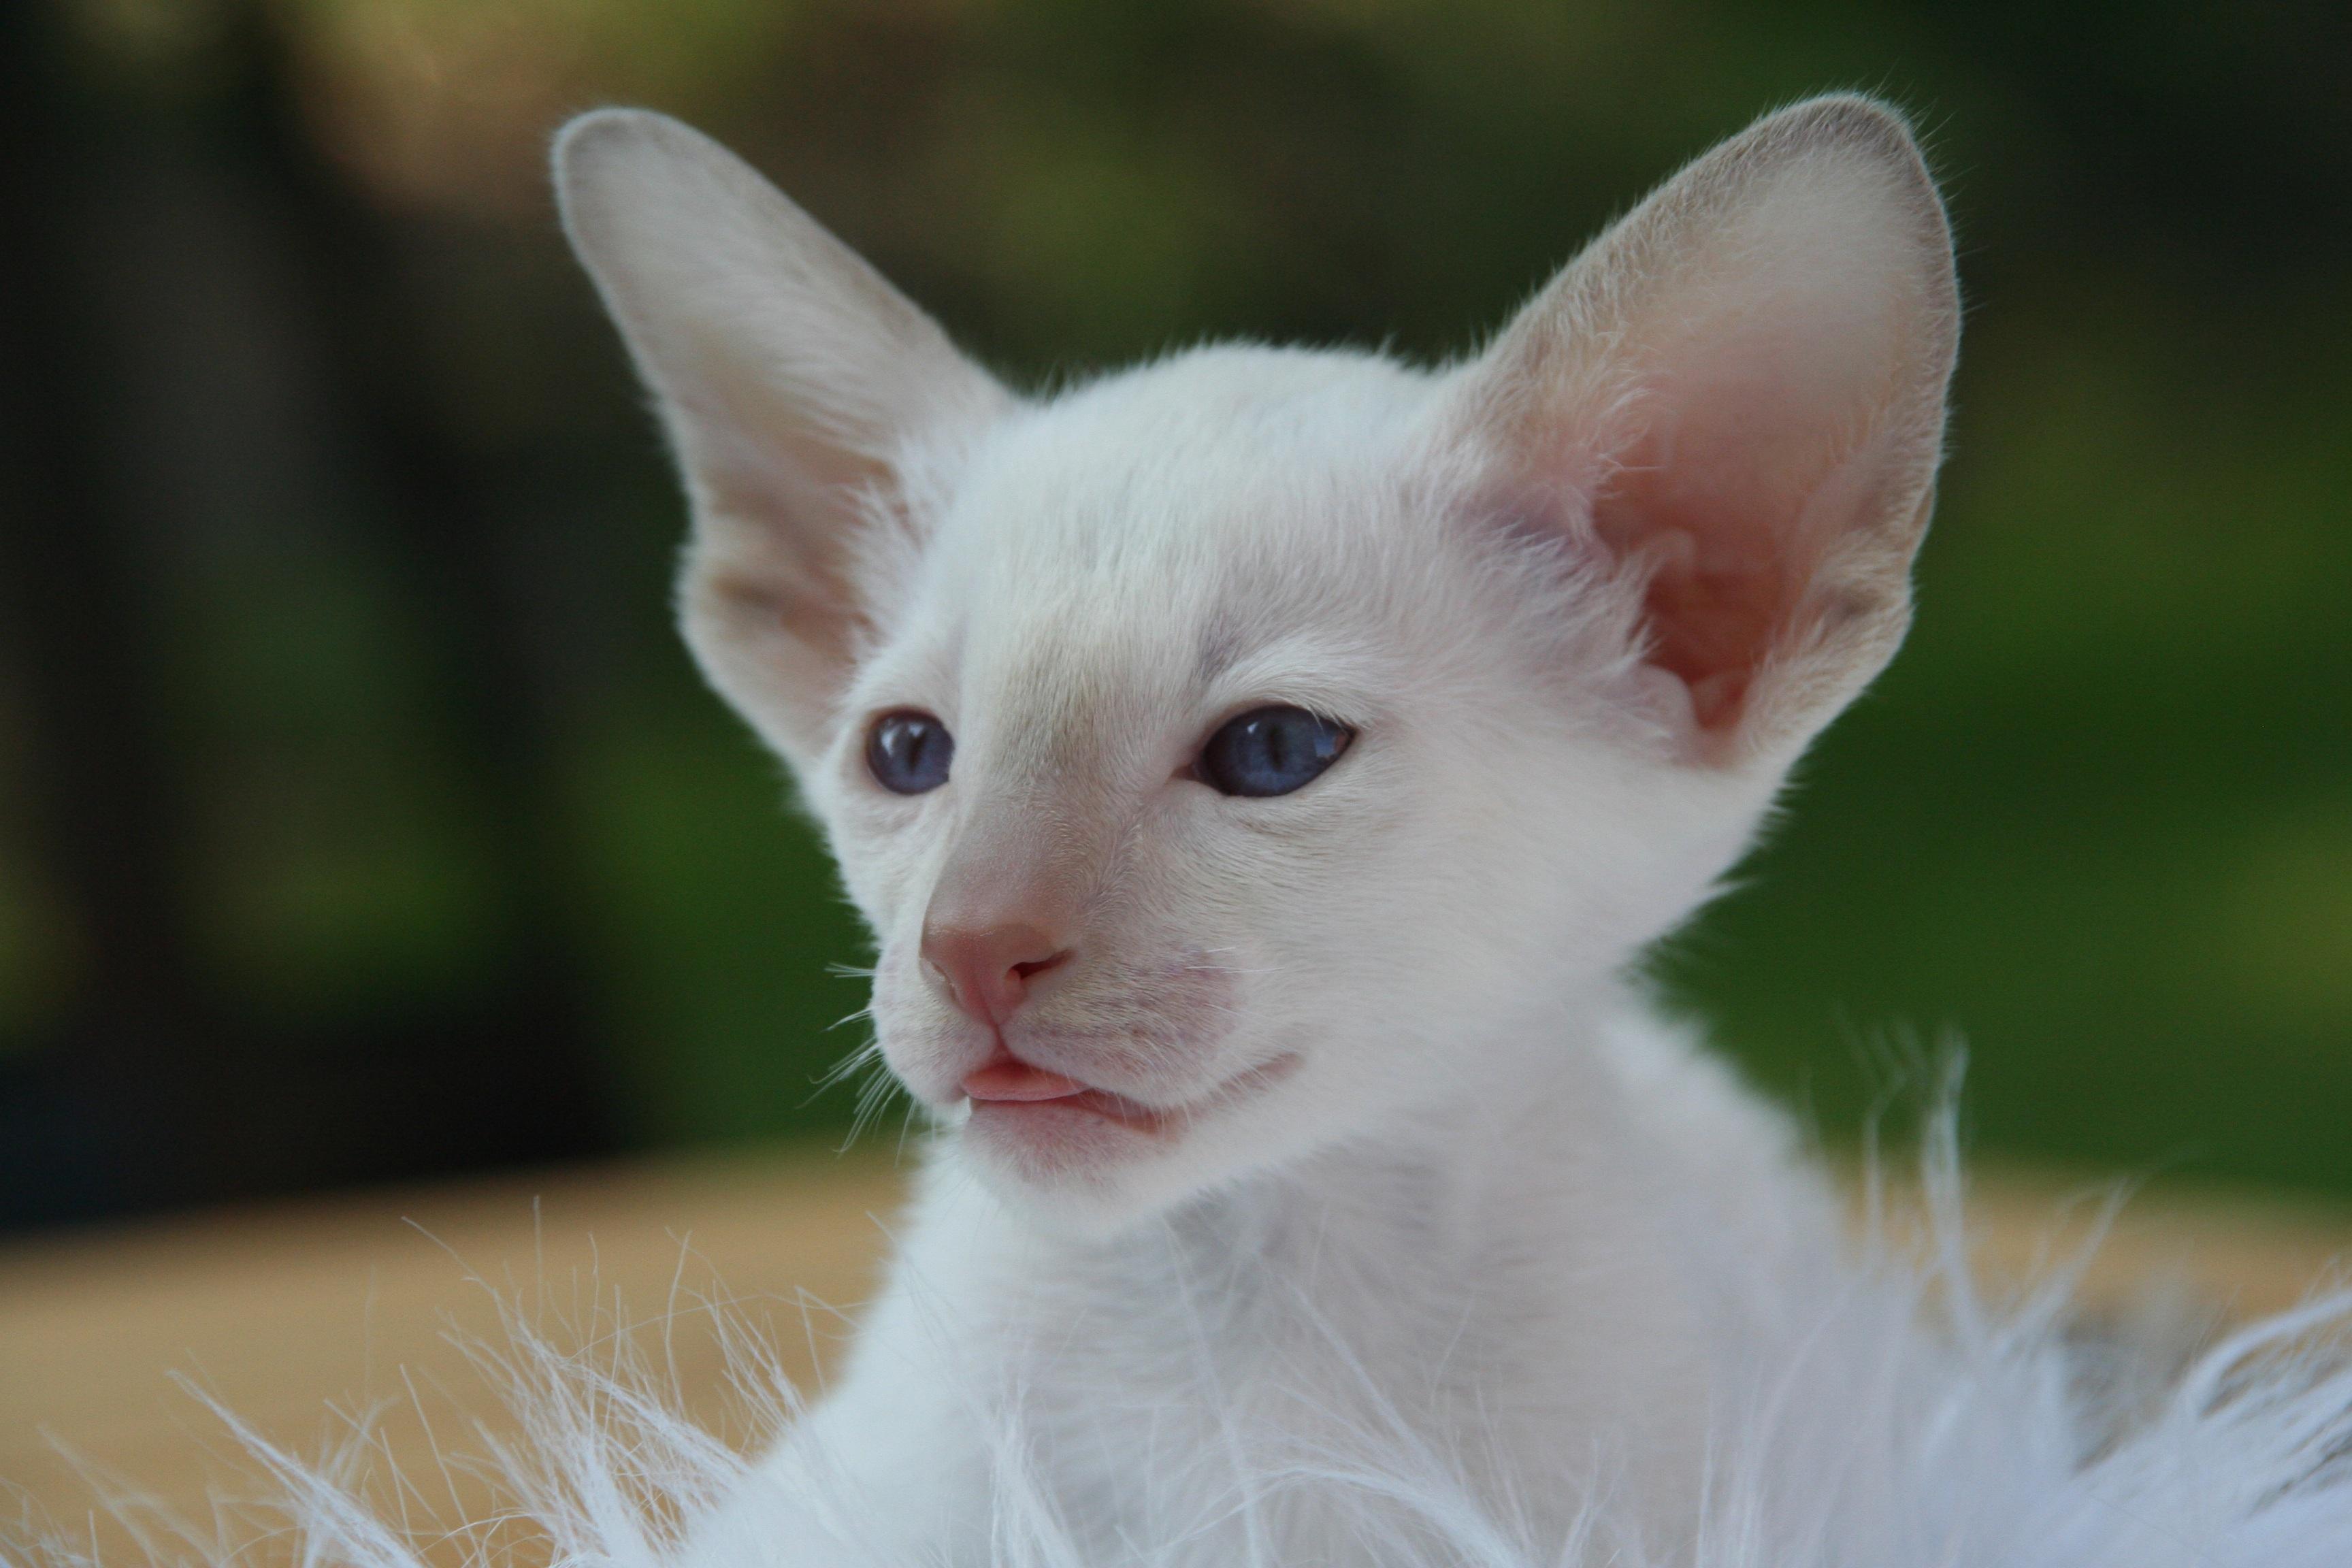 Free Images Hair White Animal Cute Pet Fur Portrait Green